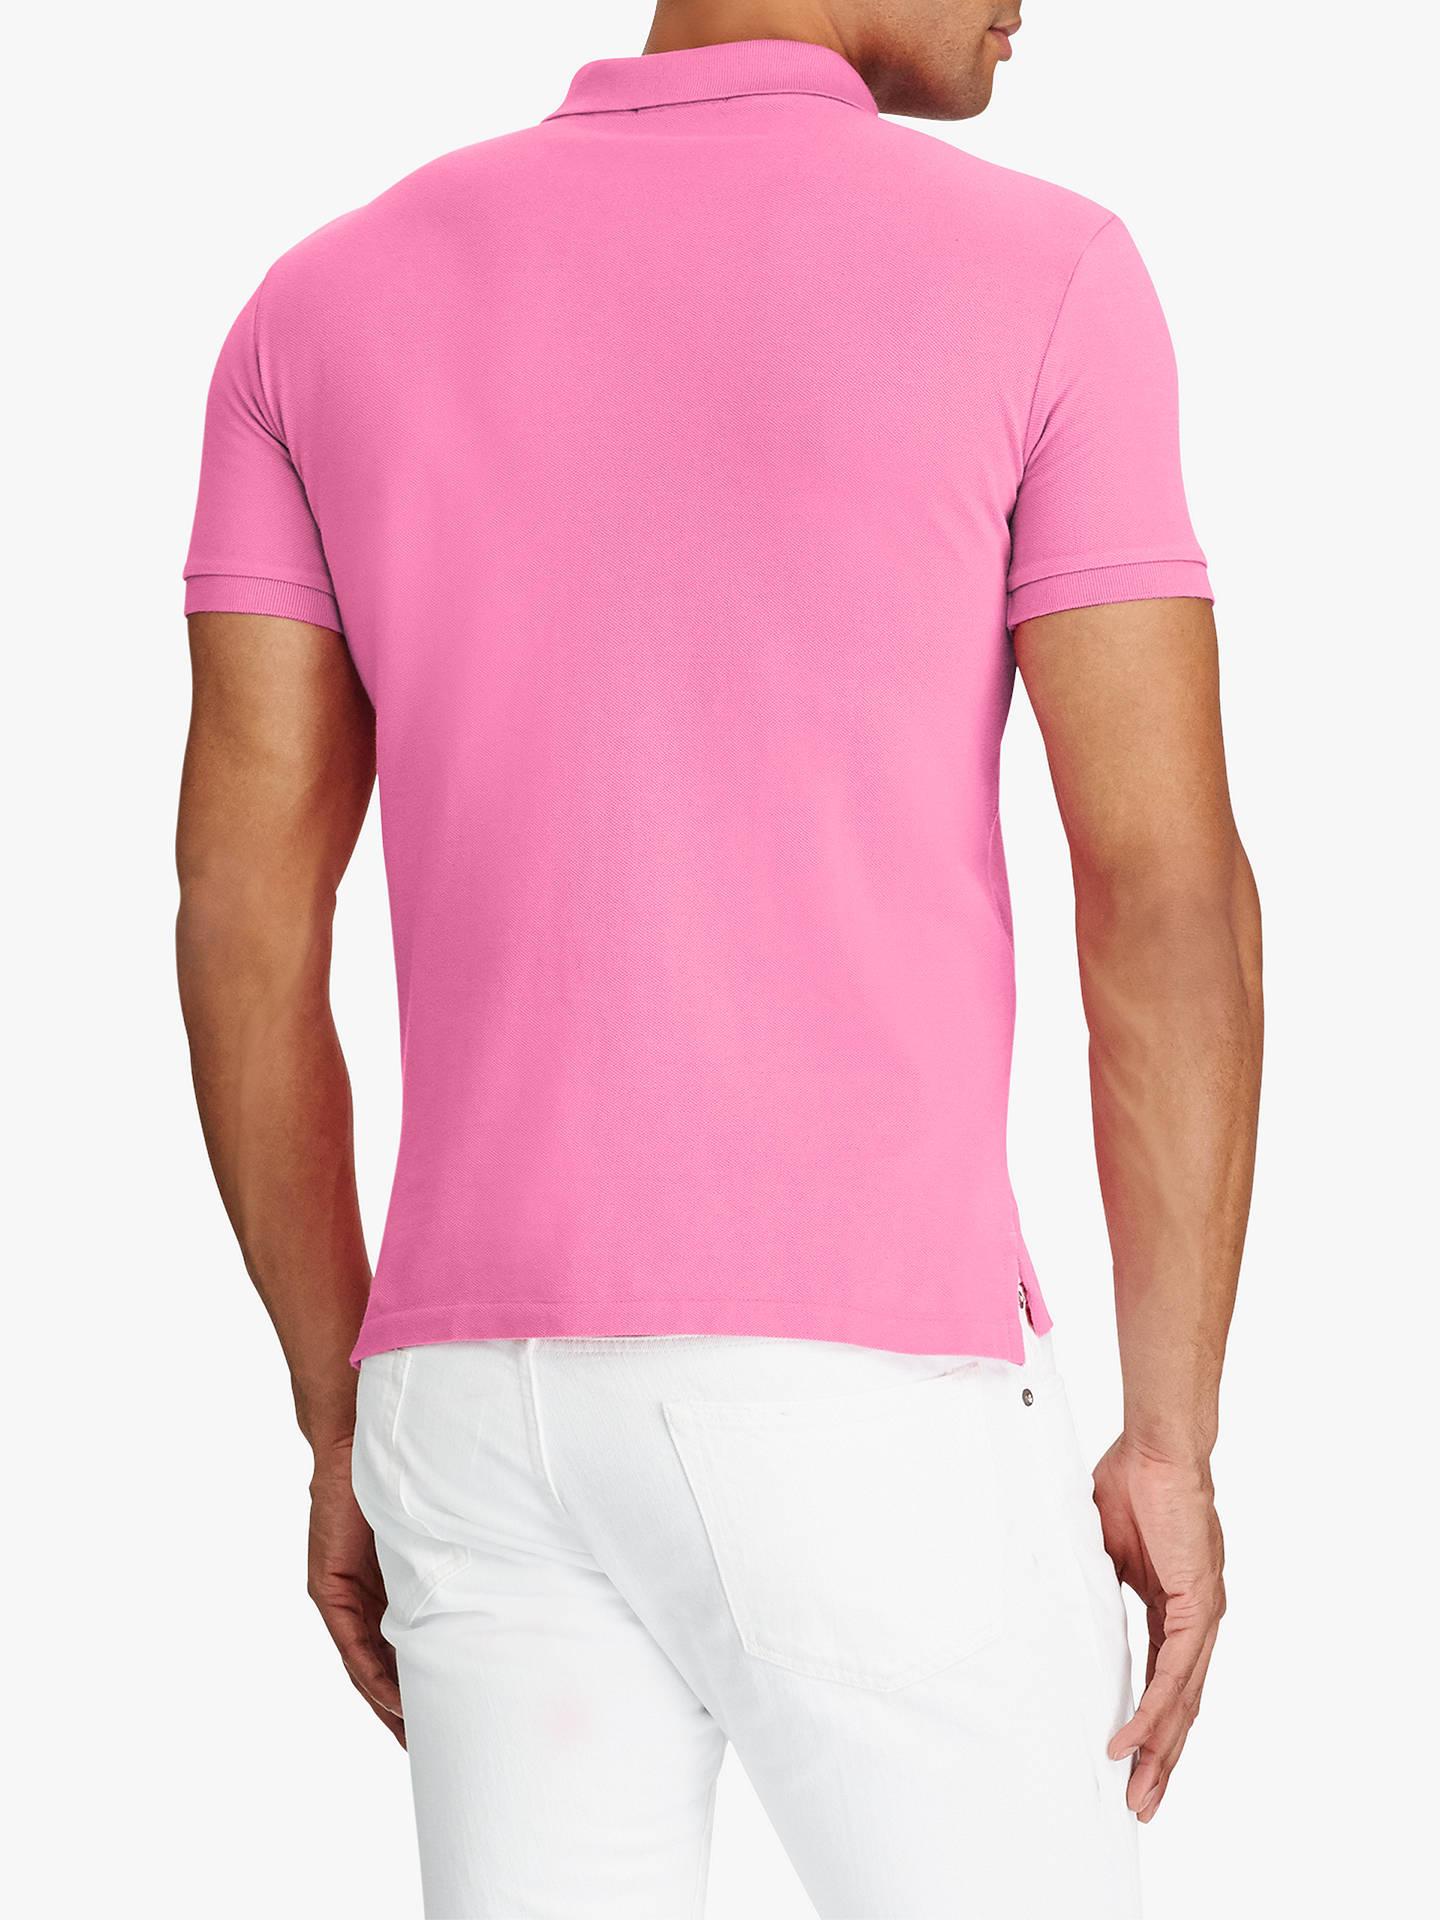 f5a59cdad7be Polo Ralph Lauren Mesh Polo Shirt, Maui Pink